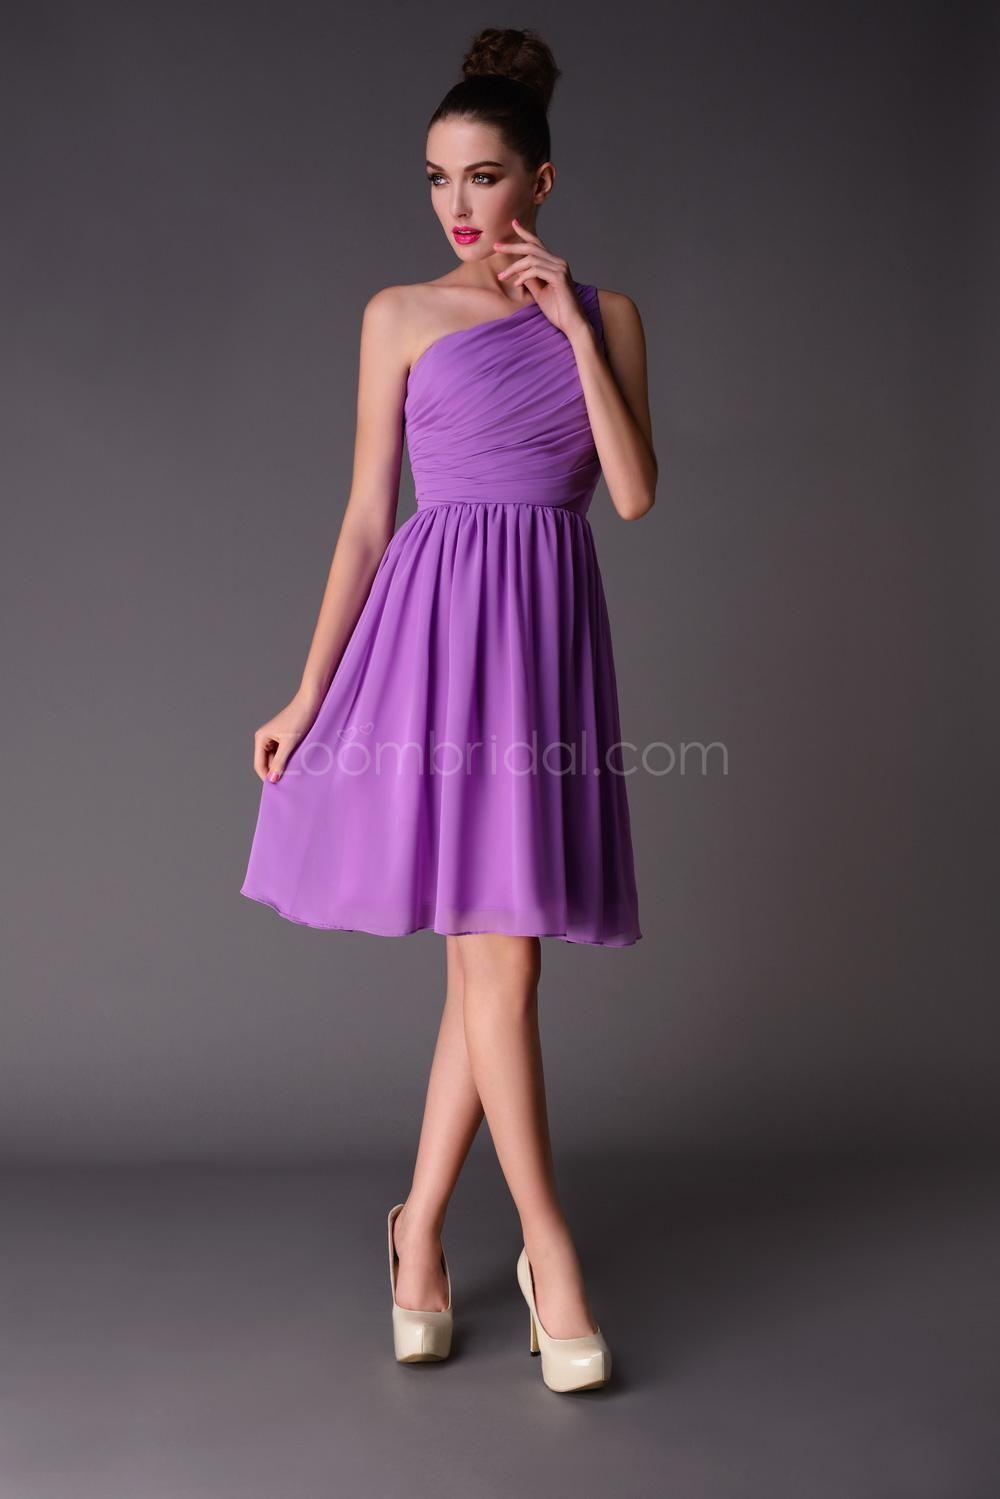 Lilac Bridesmaid Dress One Shoulder Pleated Chiffon A line Knee ...